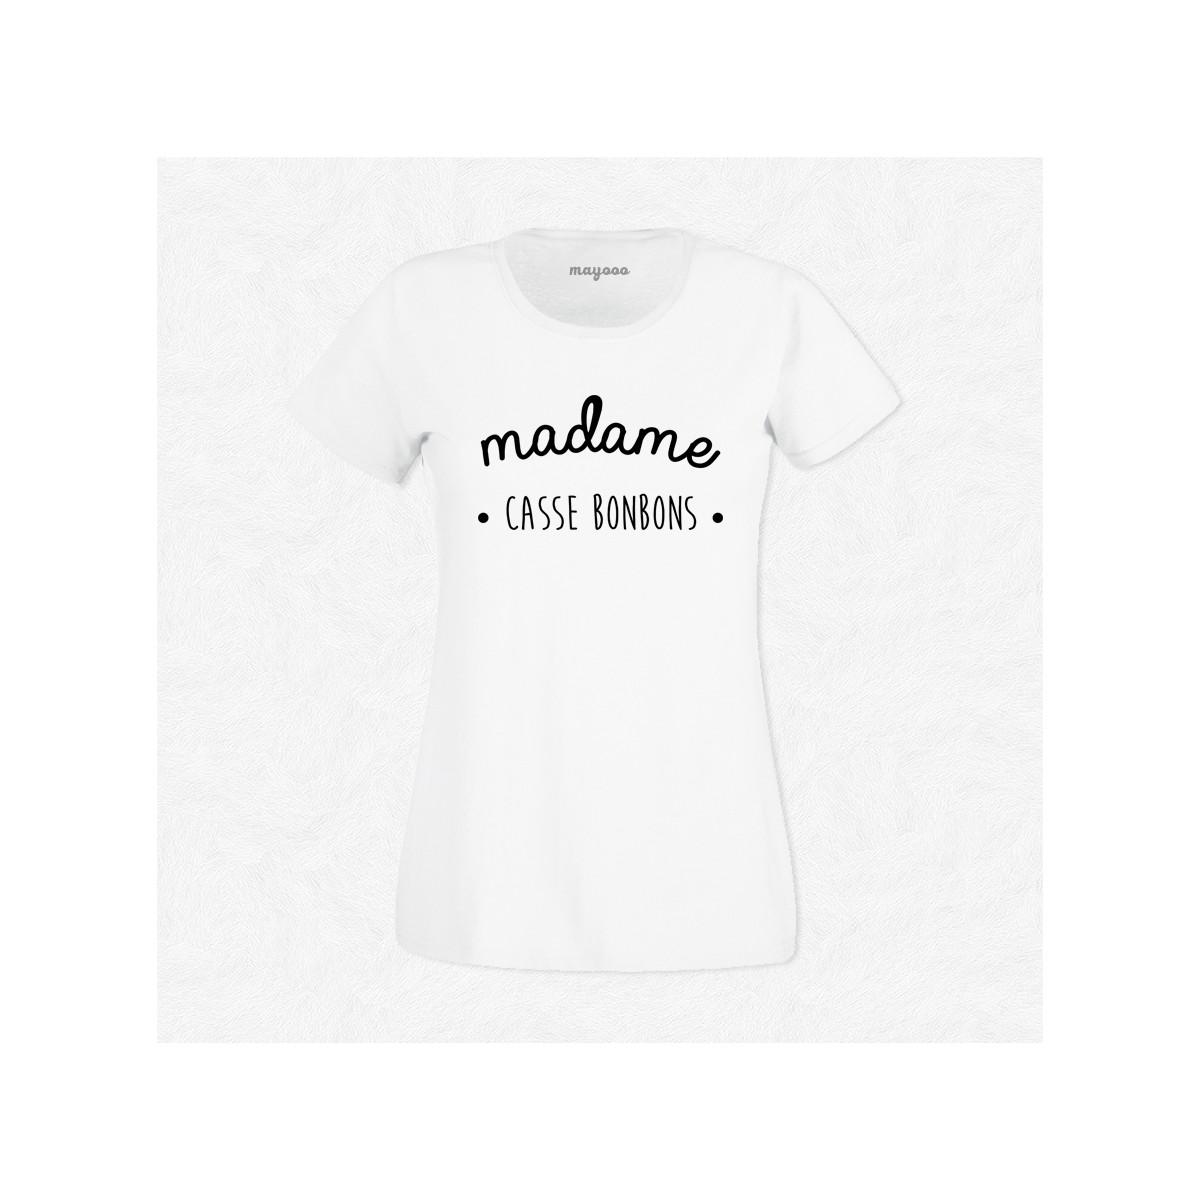 T-shirt Madame casse bonbons